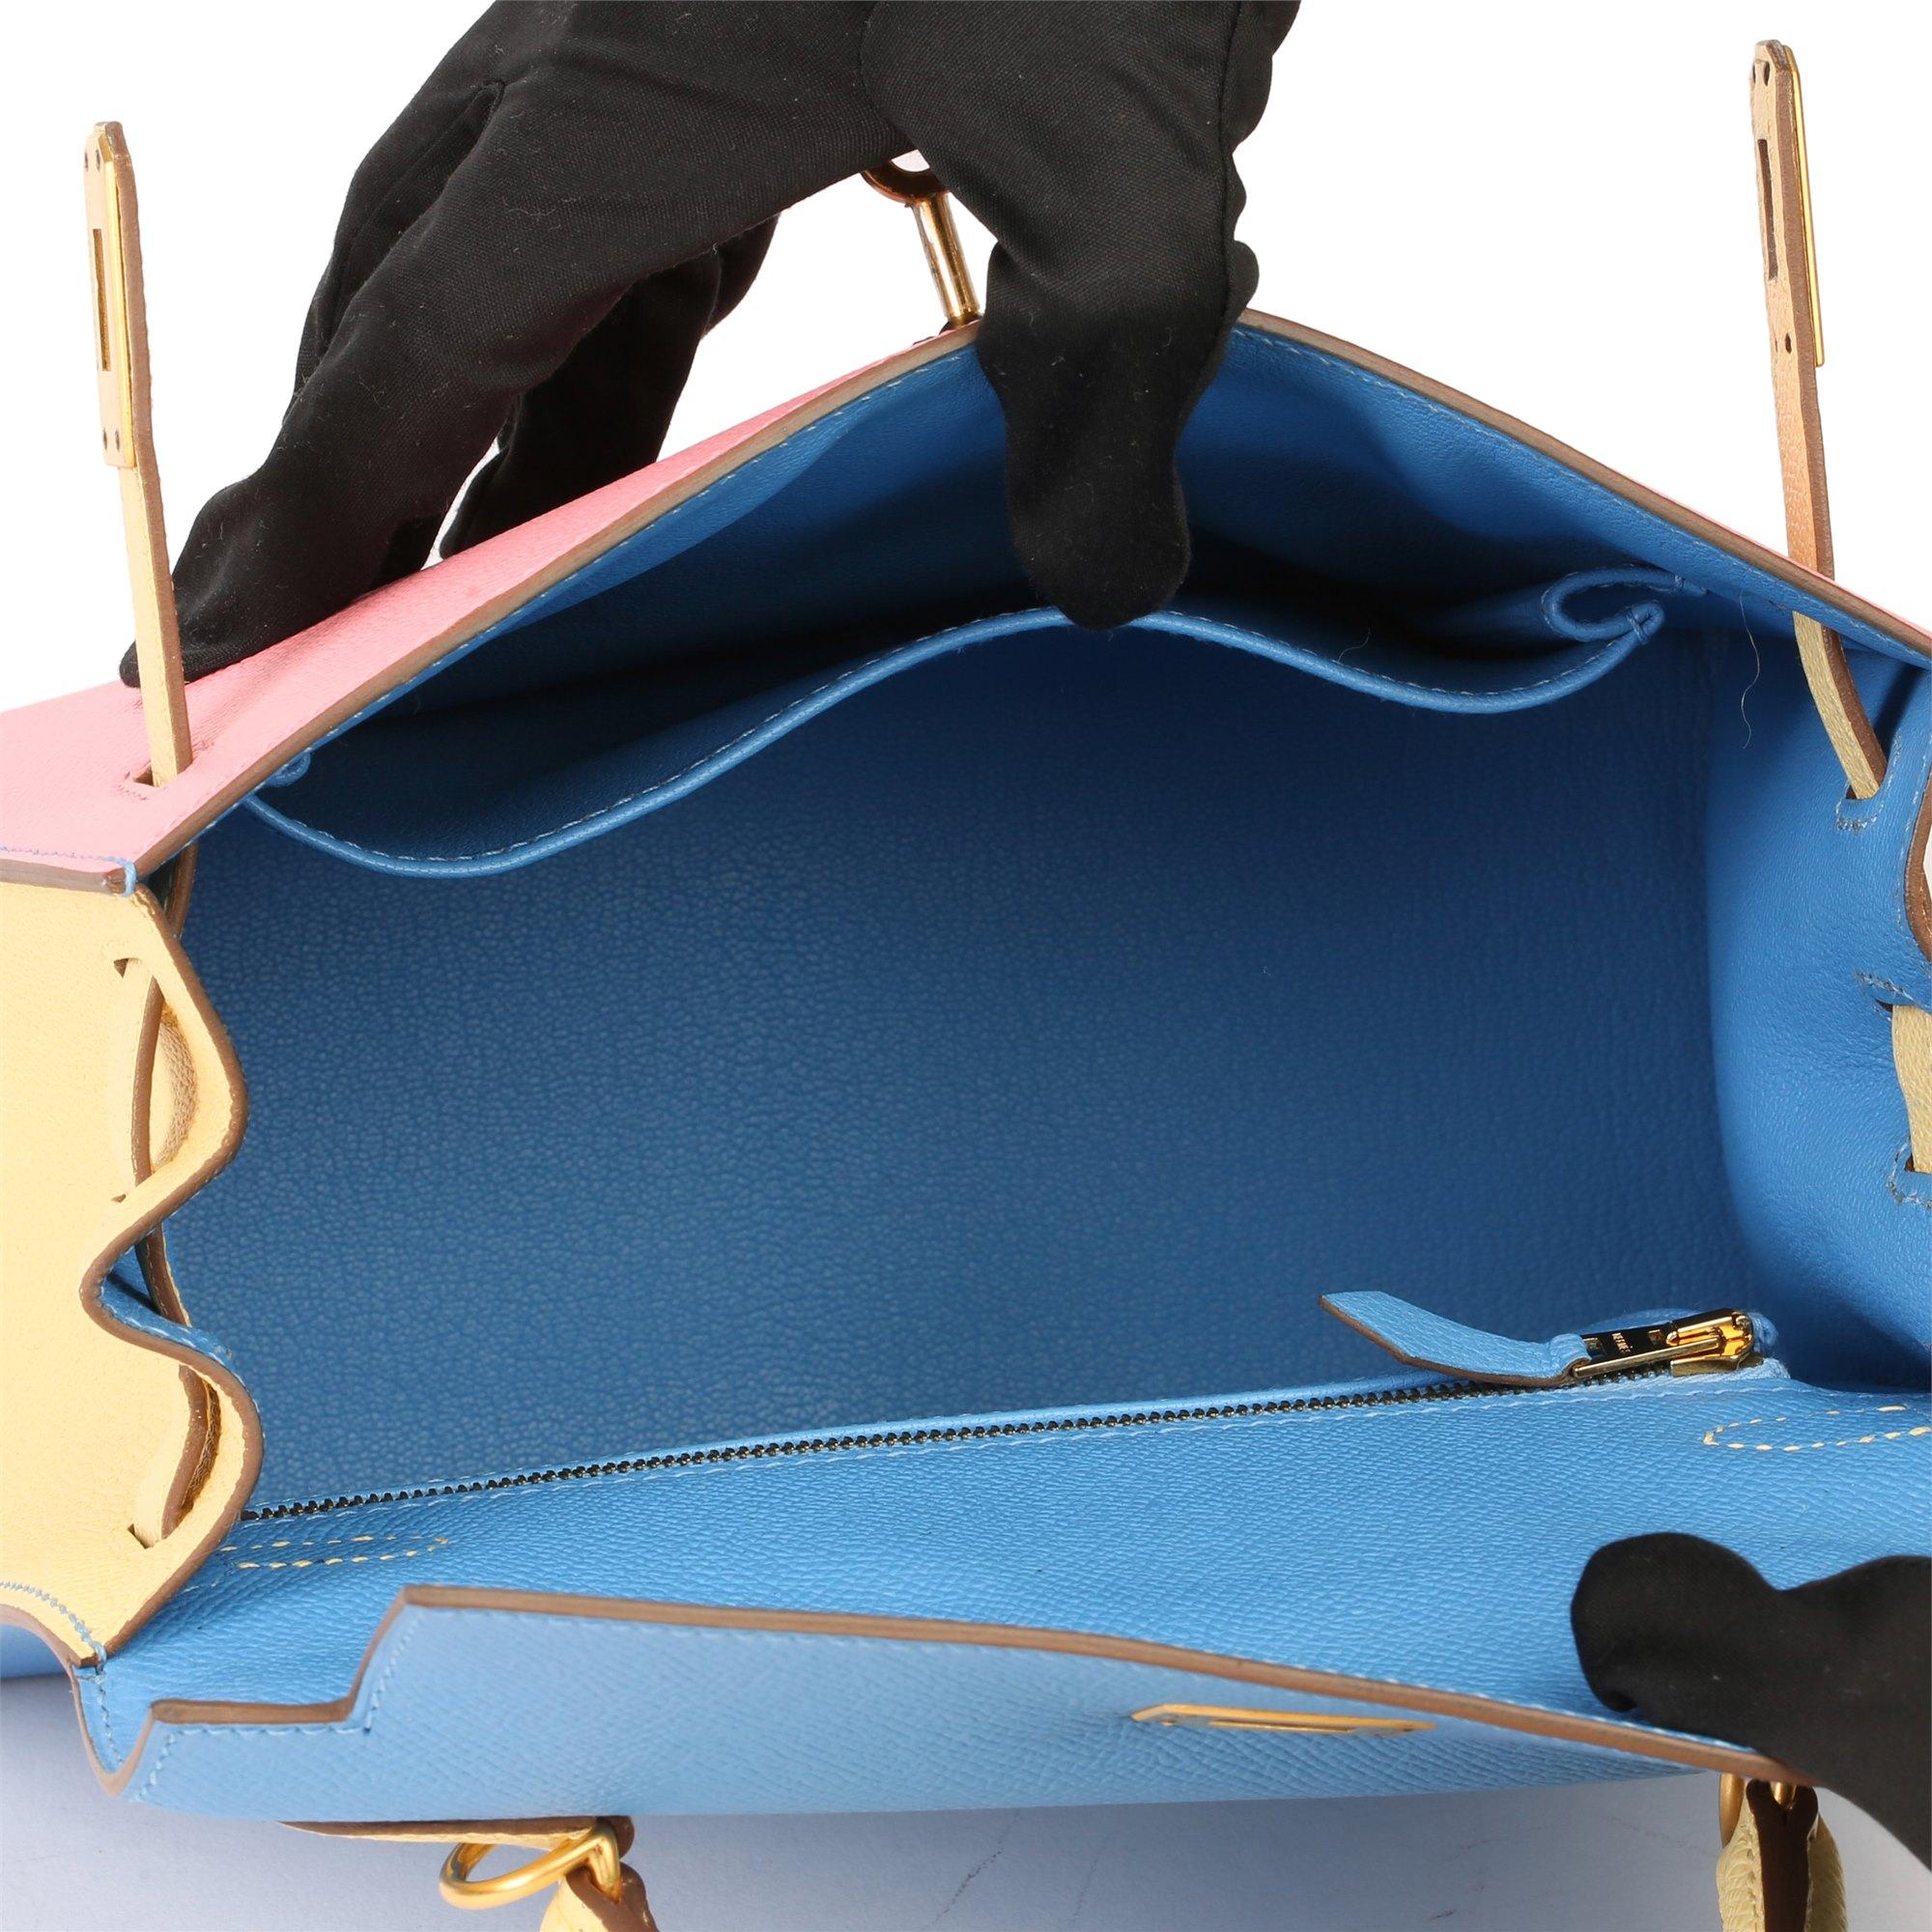 Hermès Rose Confetti, Jaune Poussin & Bleu Hydra Epsom Leather Special Order HSS Kelly 25cm Sellier